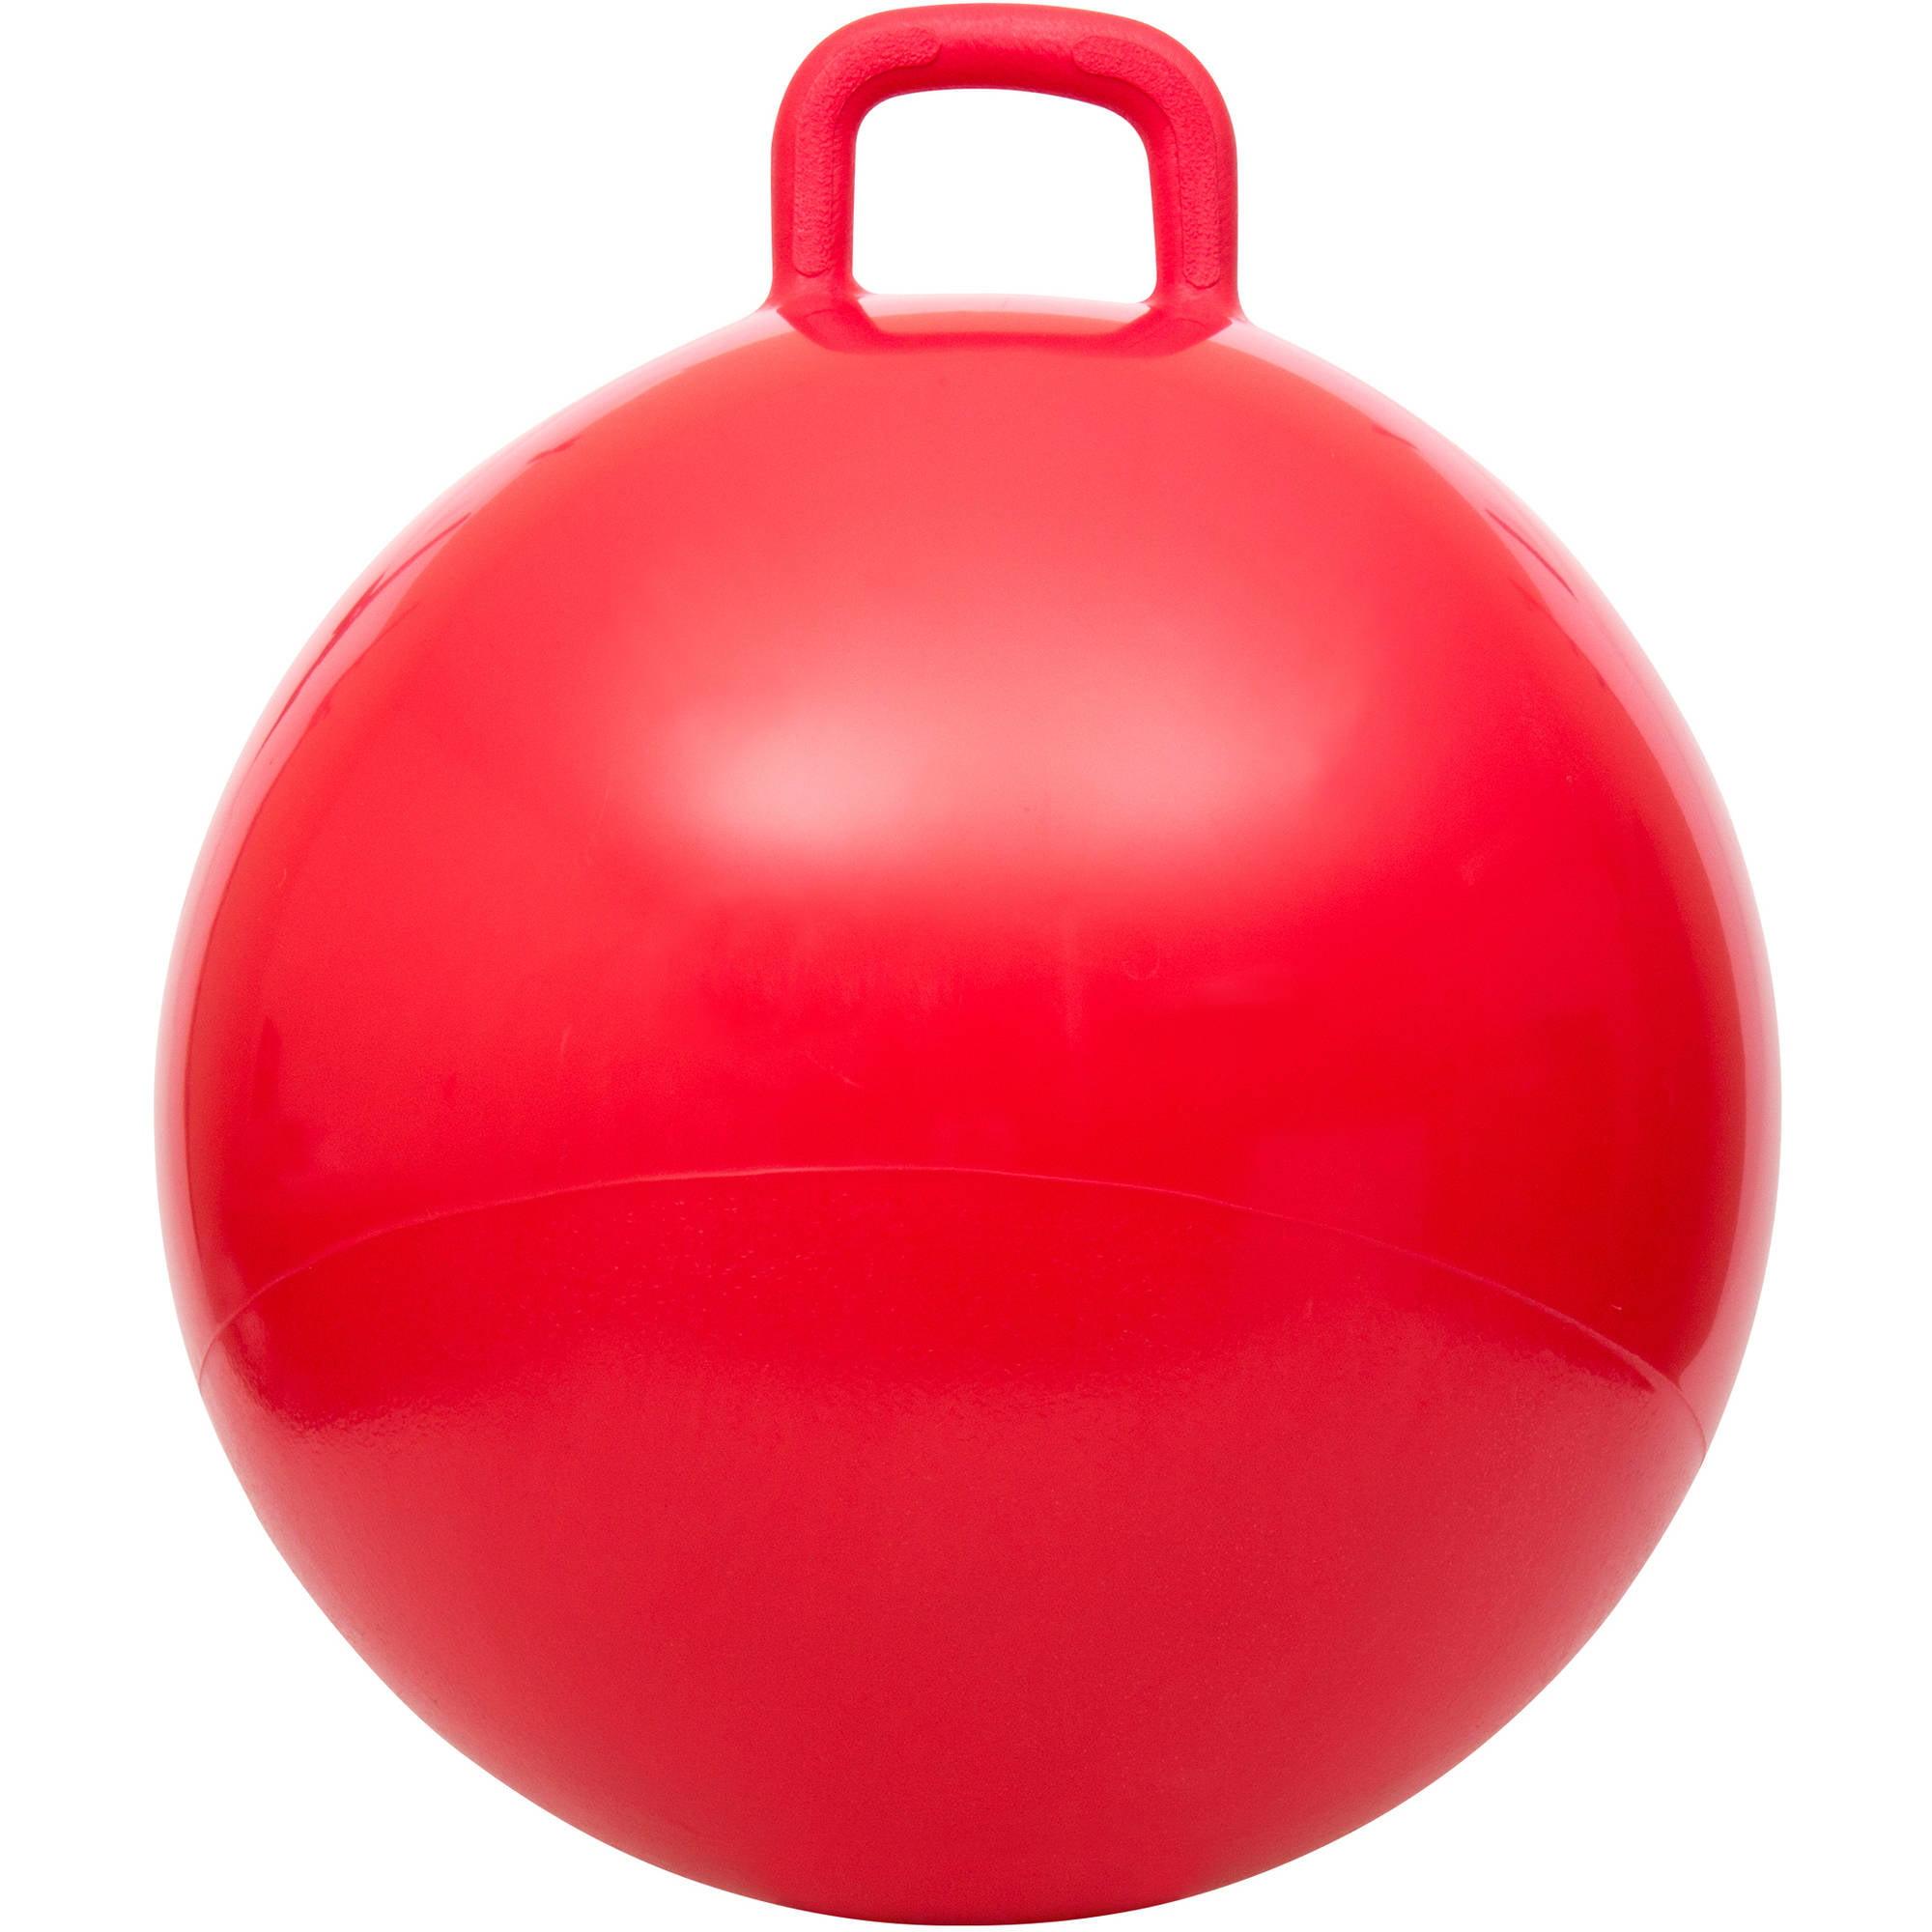 Pogo Ball With Handle